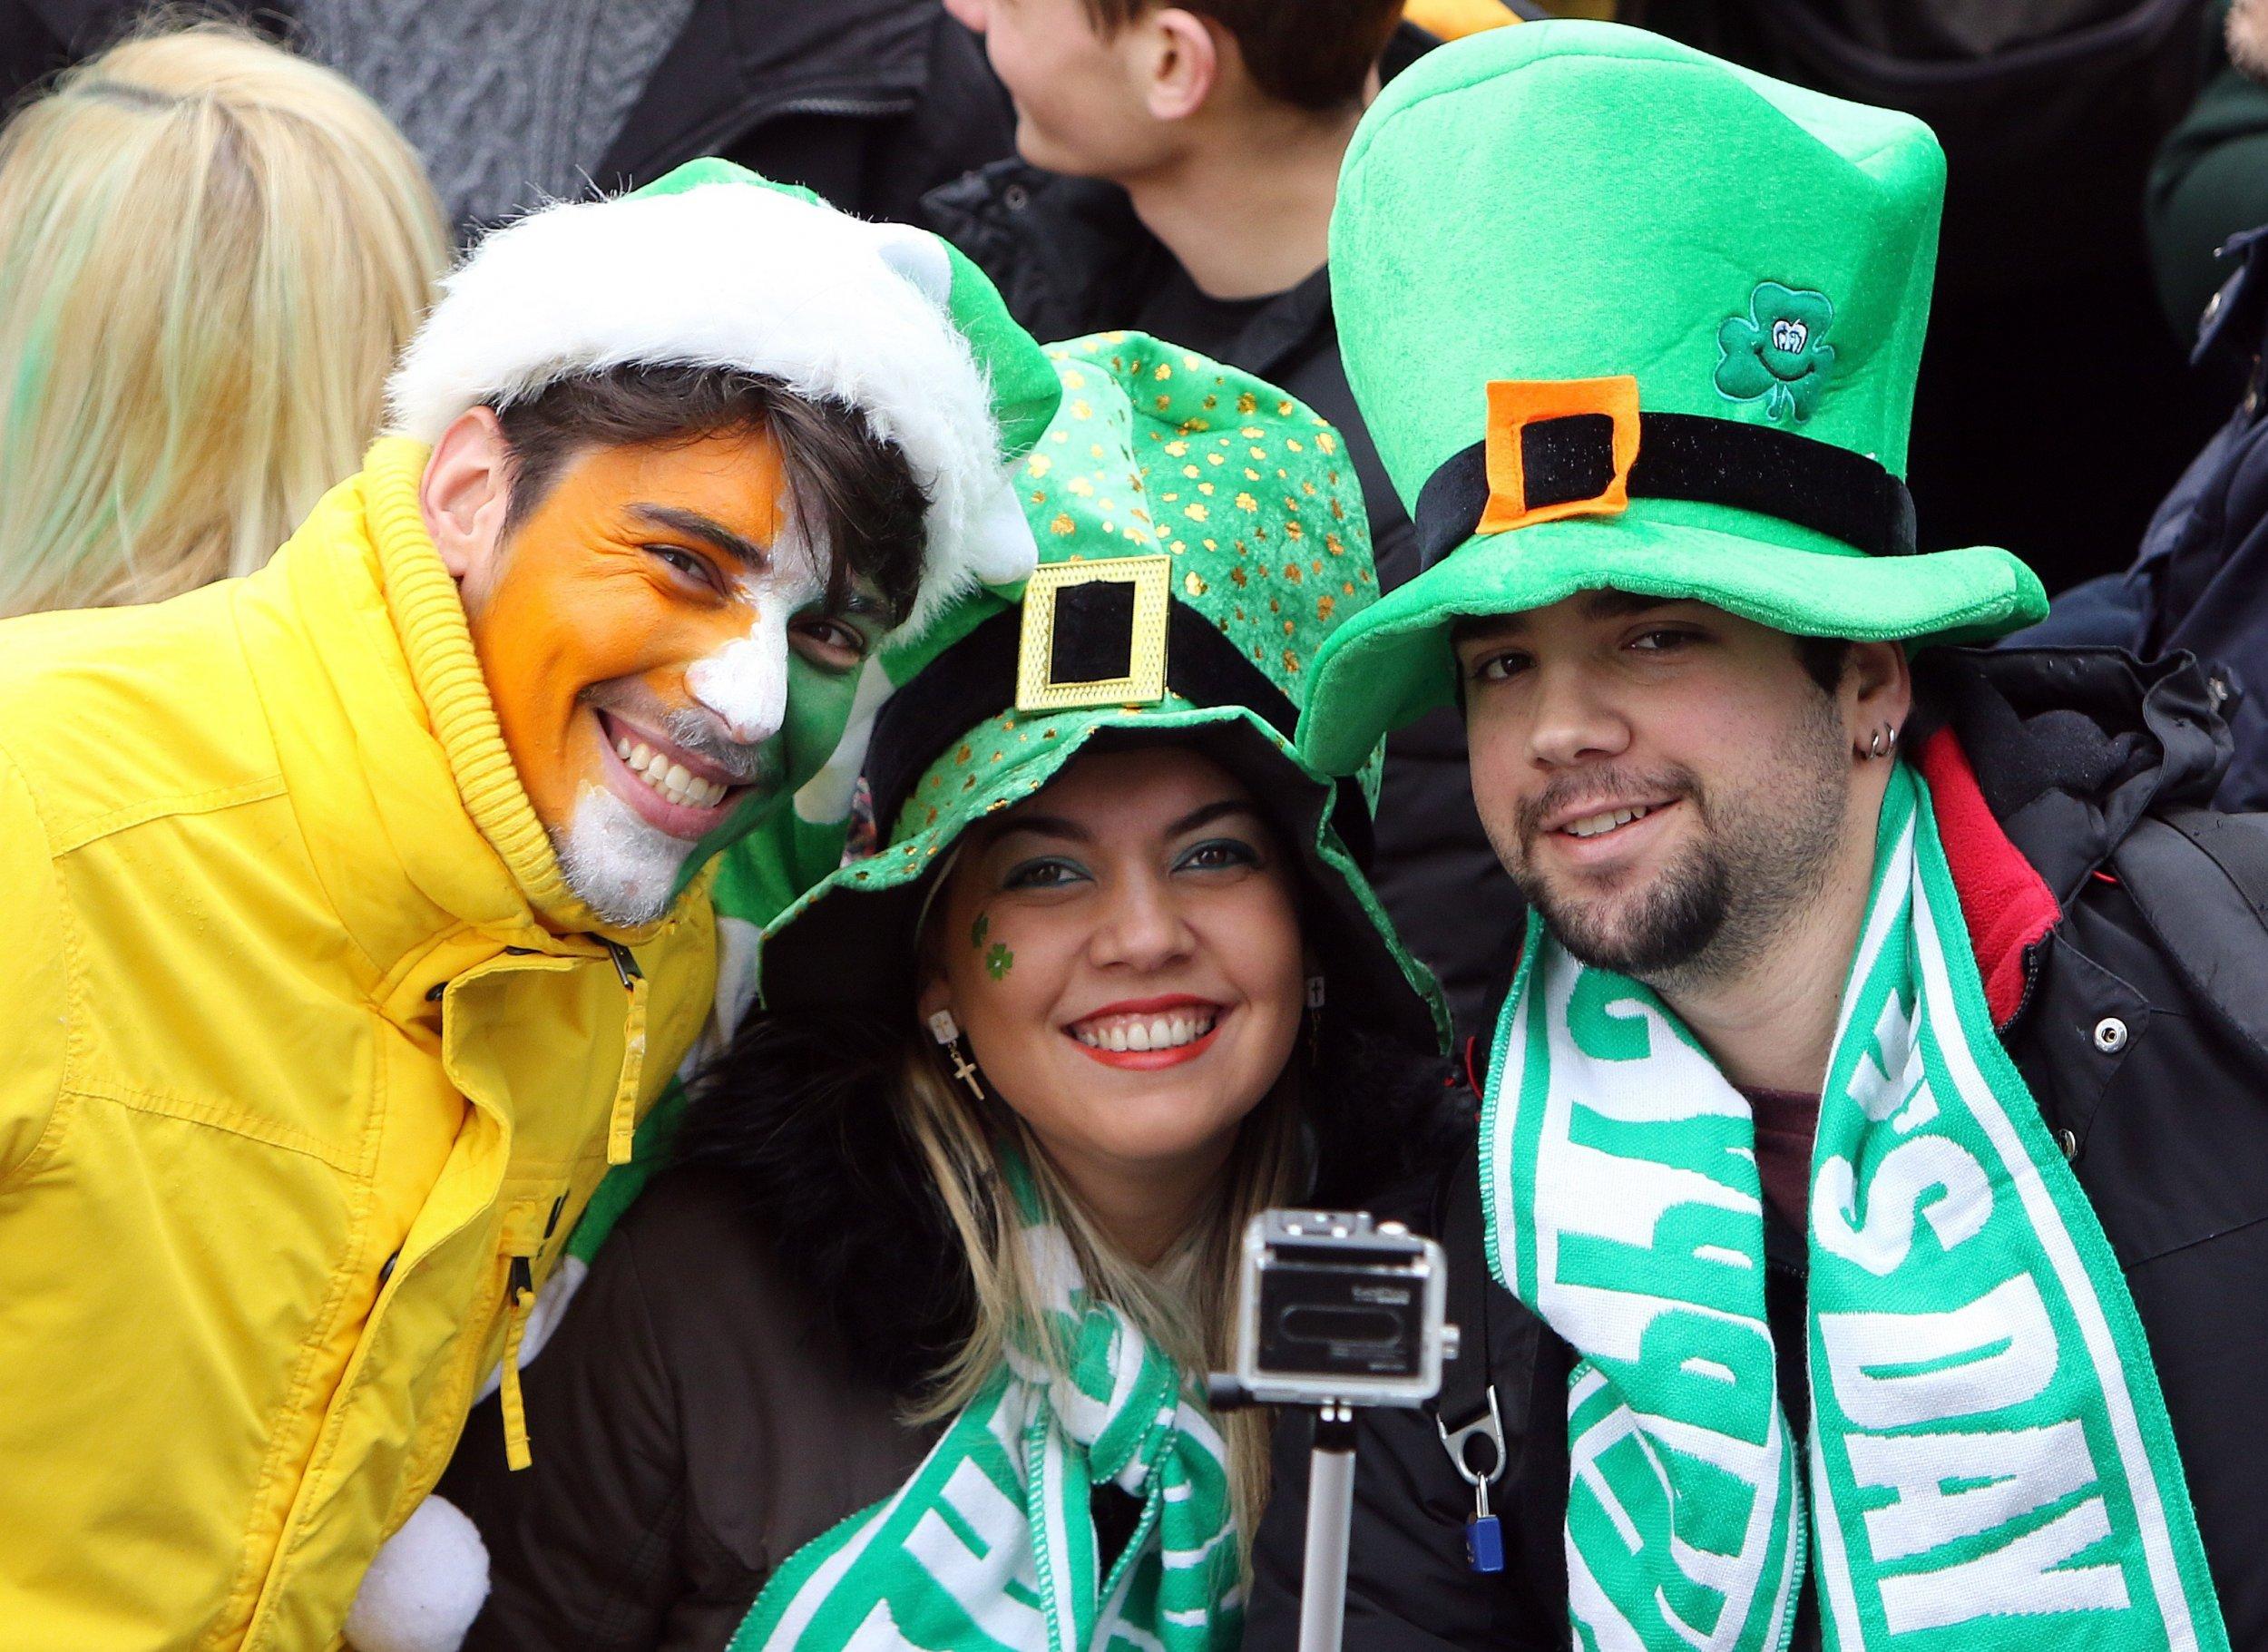 St Patrick's Day parade 2015 in Dublin